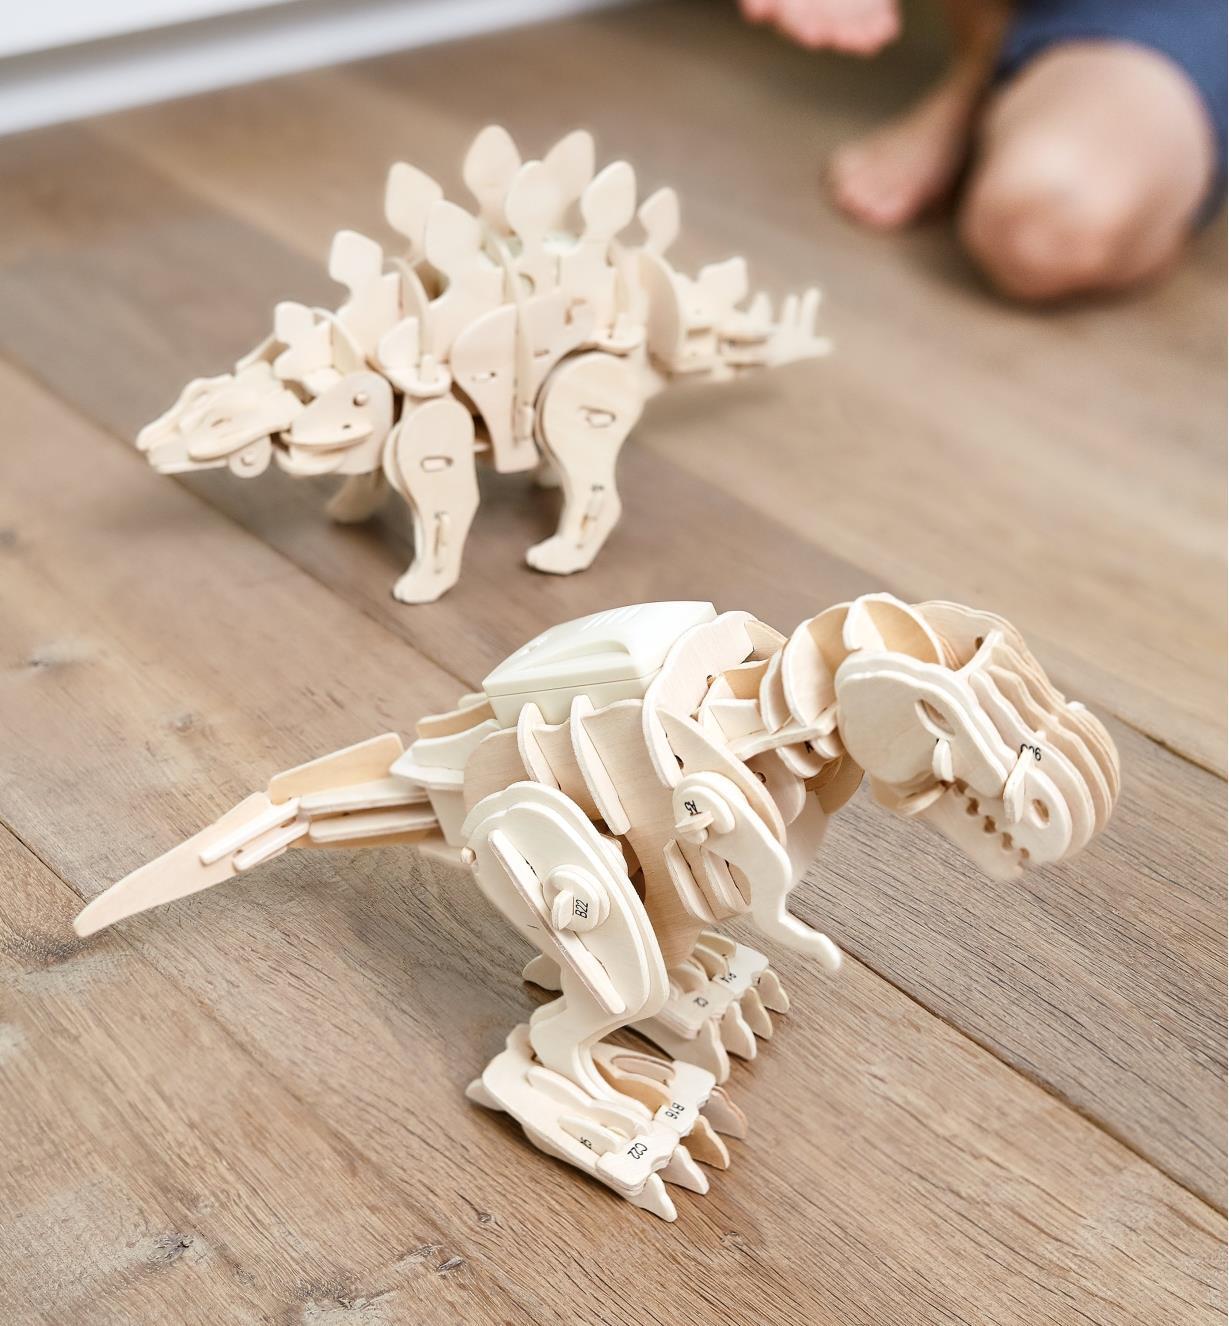 Modèles réduits animés – dinosaures